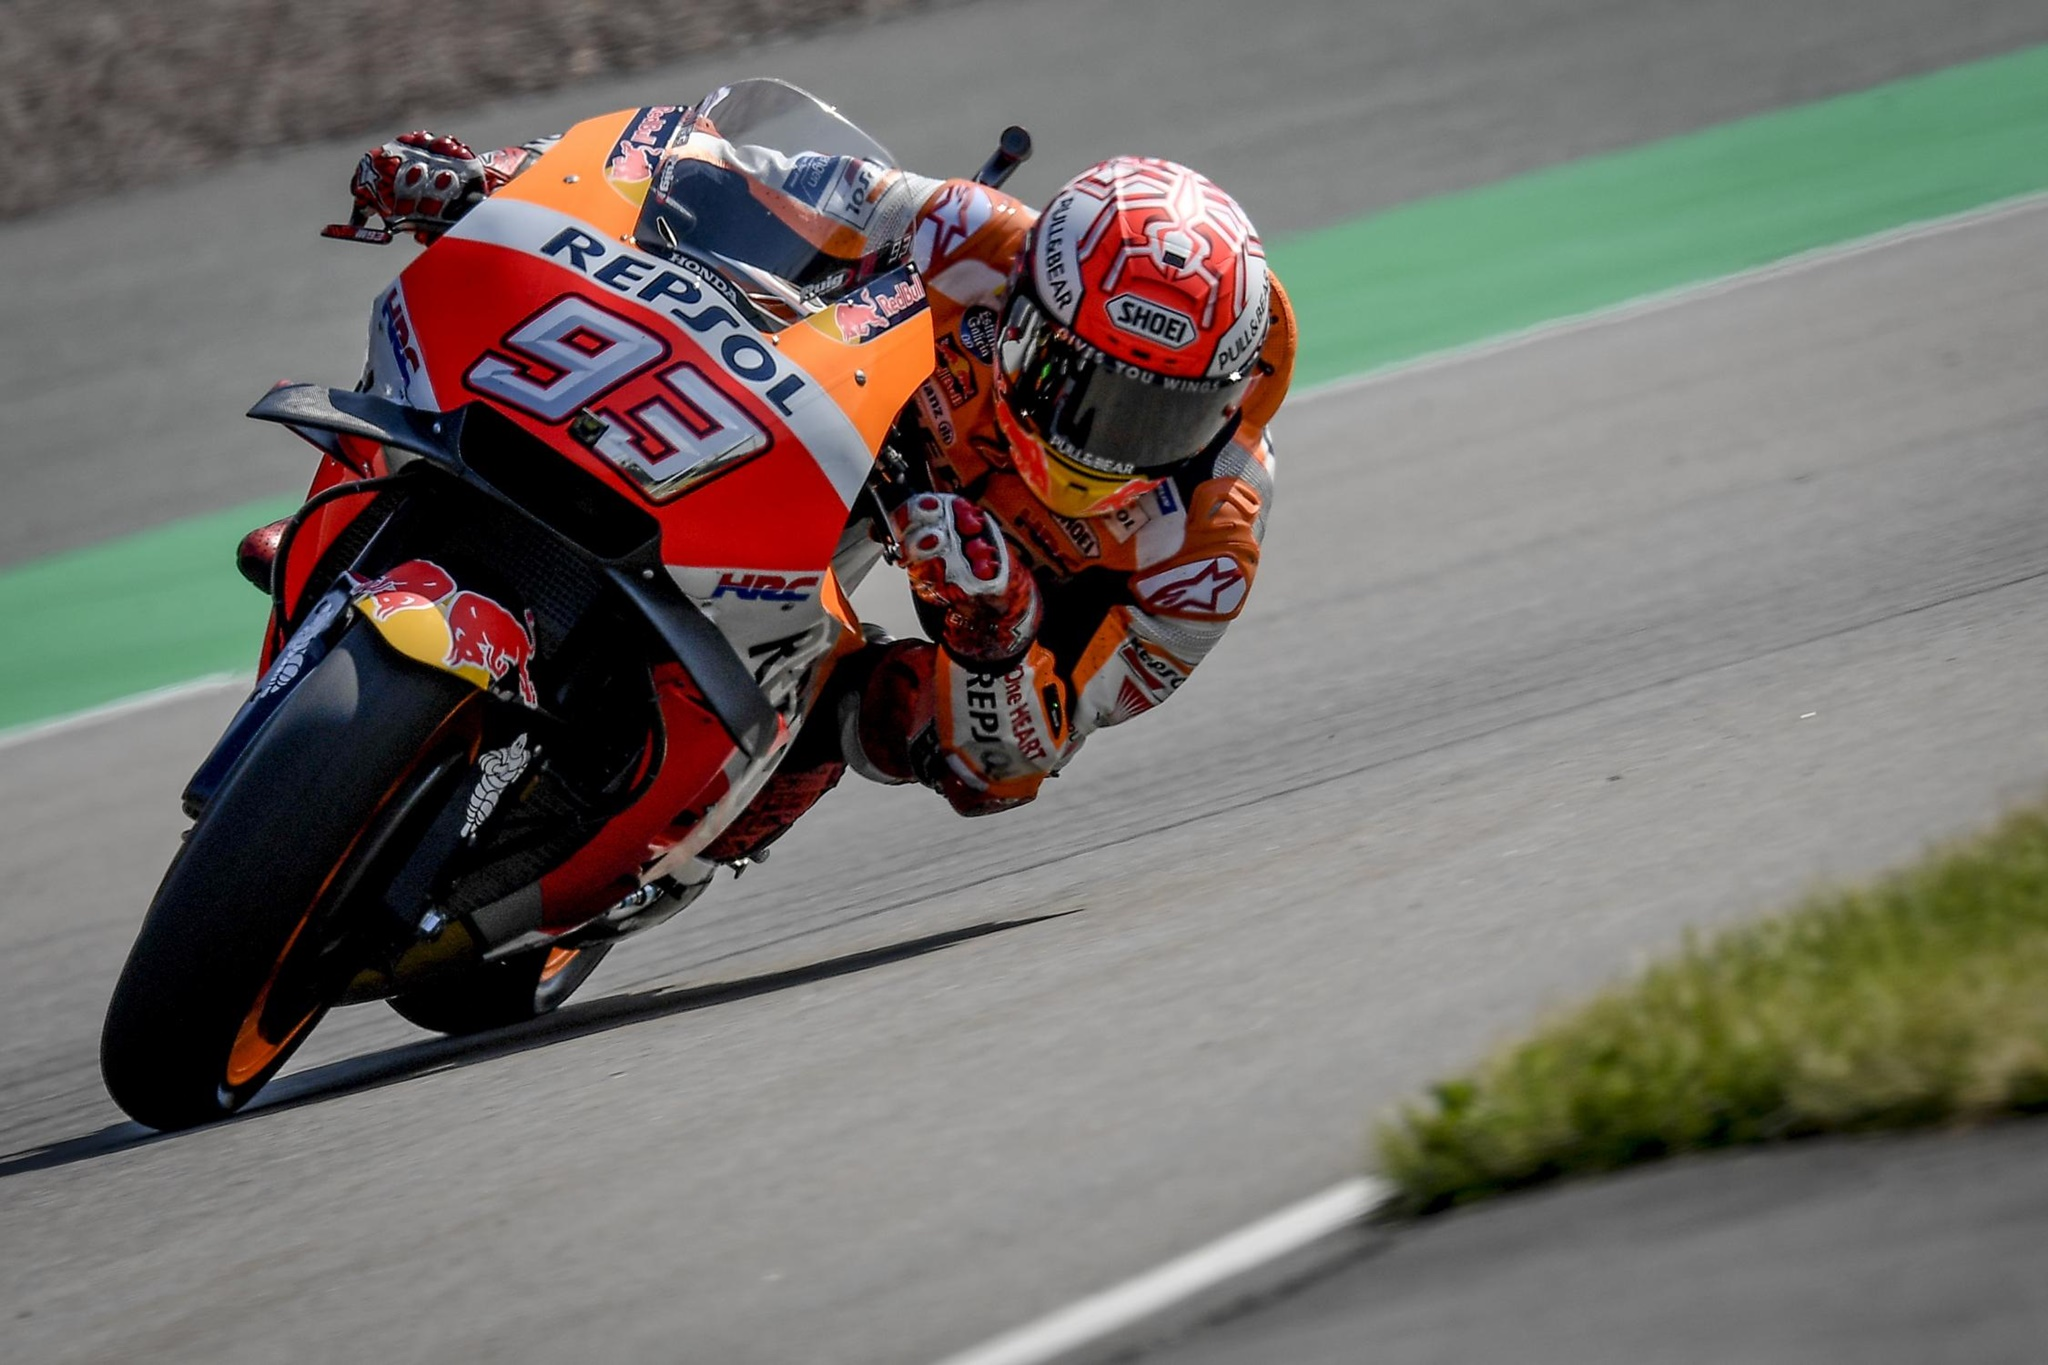 MotoGP18_GermanGP_2018_Xe_Tinhte-005.jpg